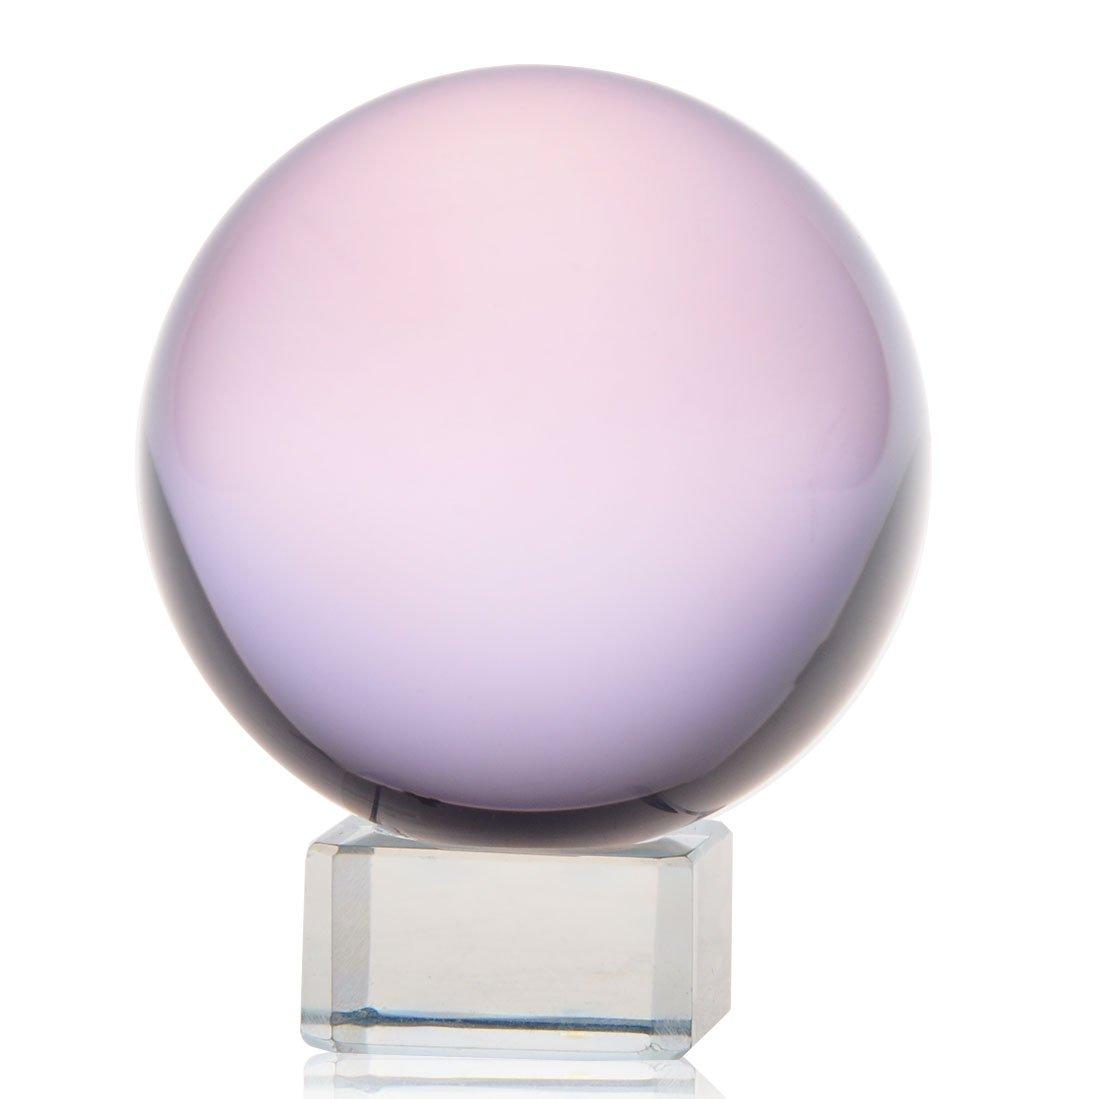 H&D Crystal Meditation Ball Globe Free Stand (pink)